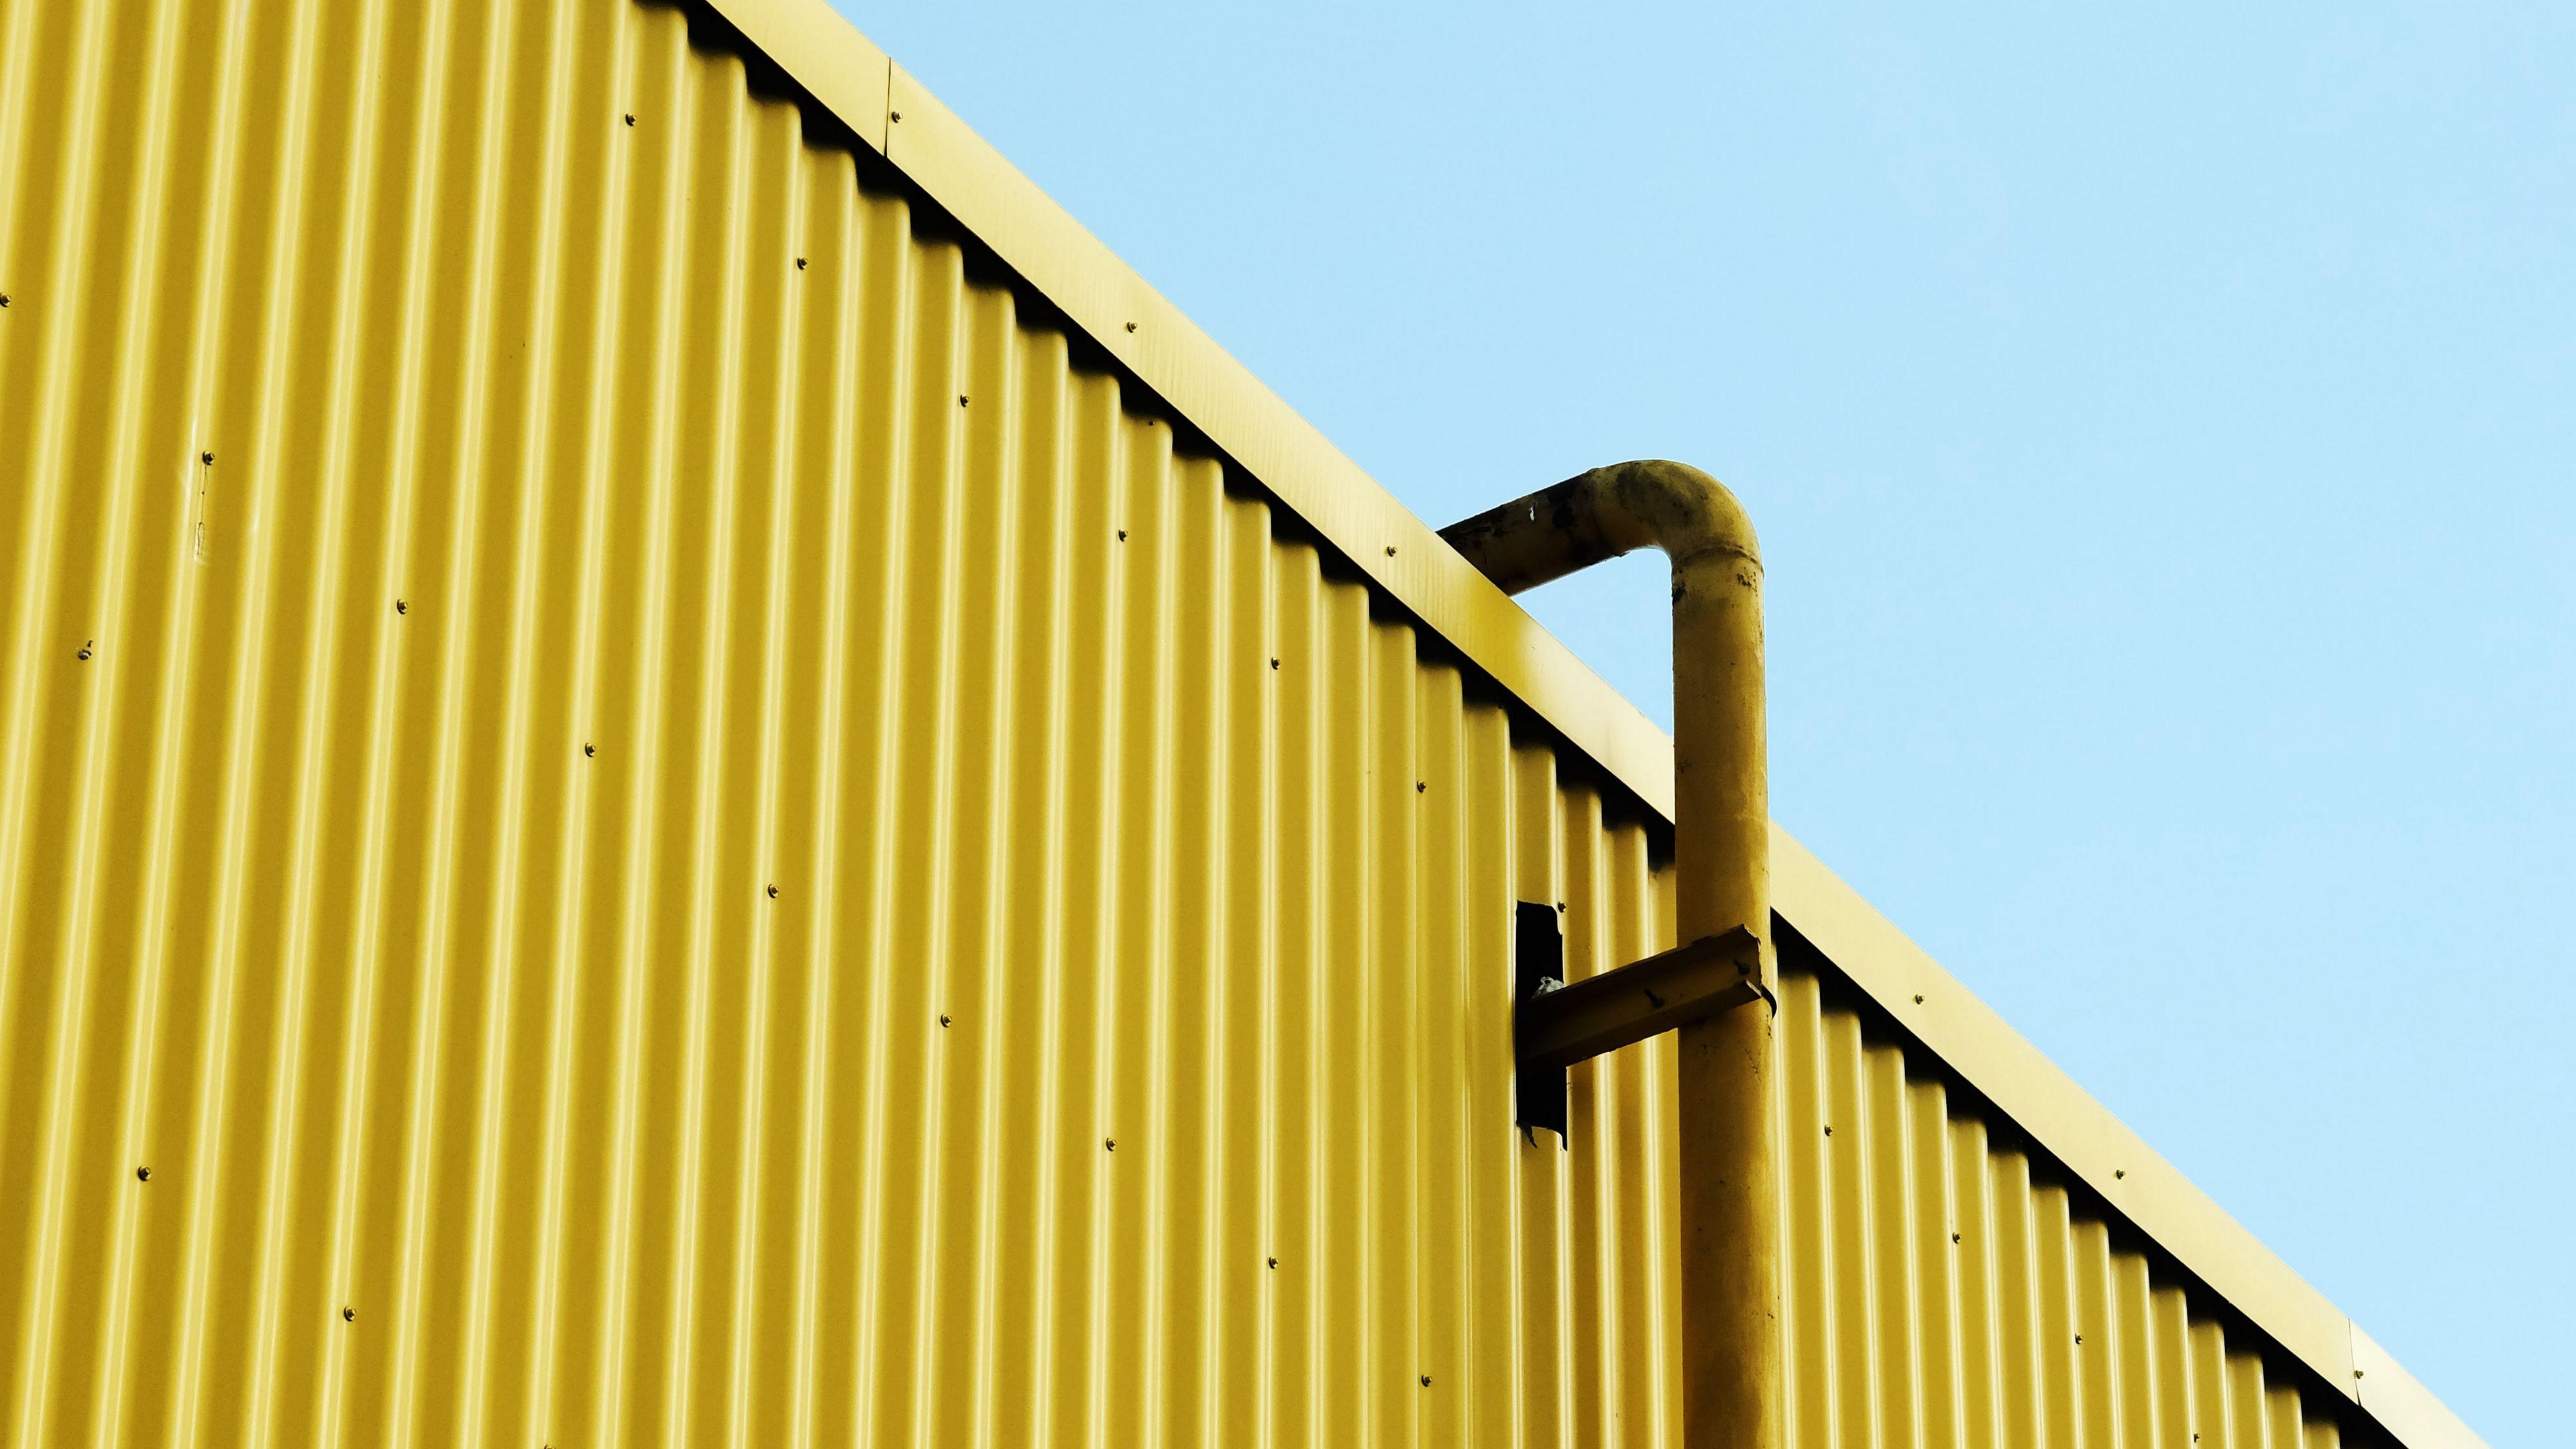 3840x2160 Wallpaper building, pipe, yellow, minimalism